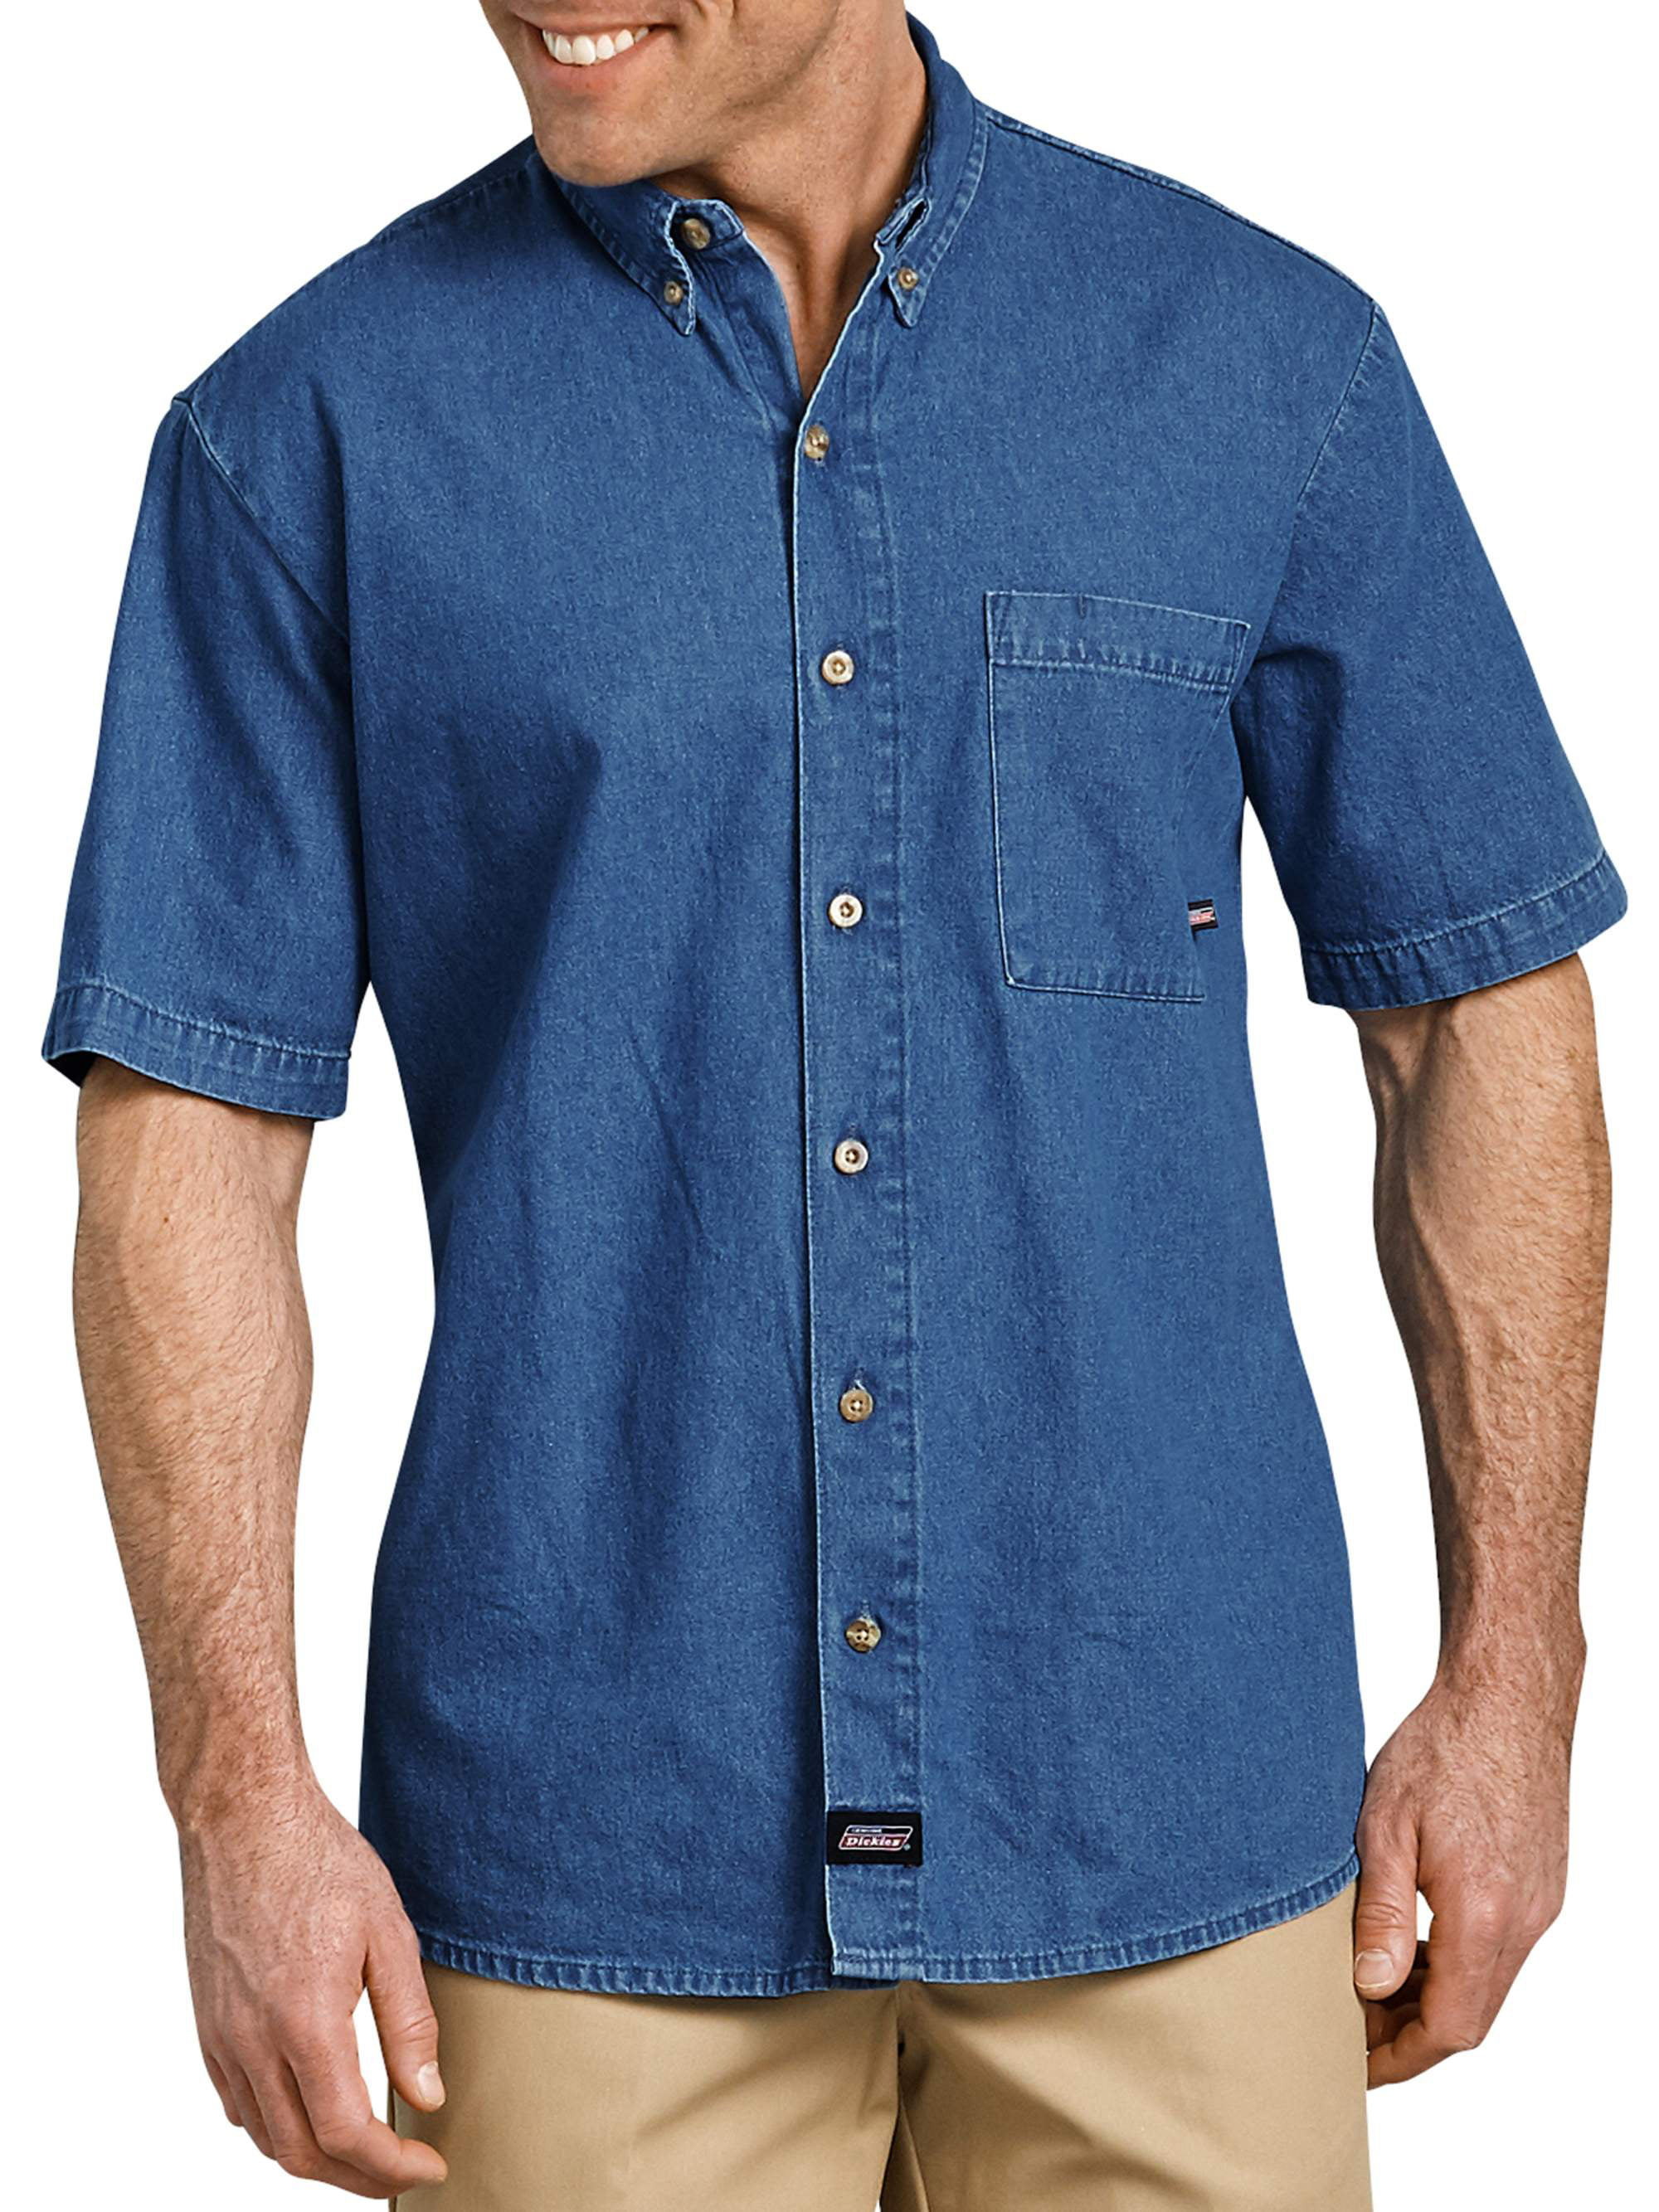 ede4c697b8 Dickies - Men s Short Sleeve Button Down Denim Shirt - Walmart.com